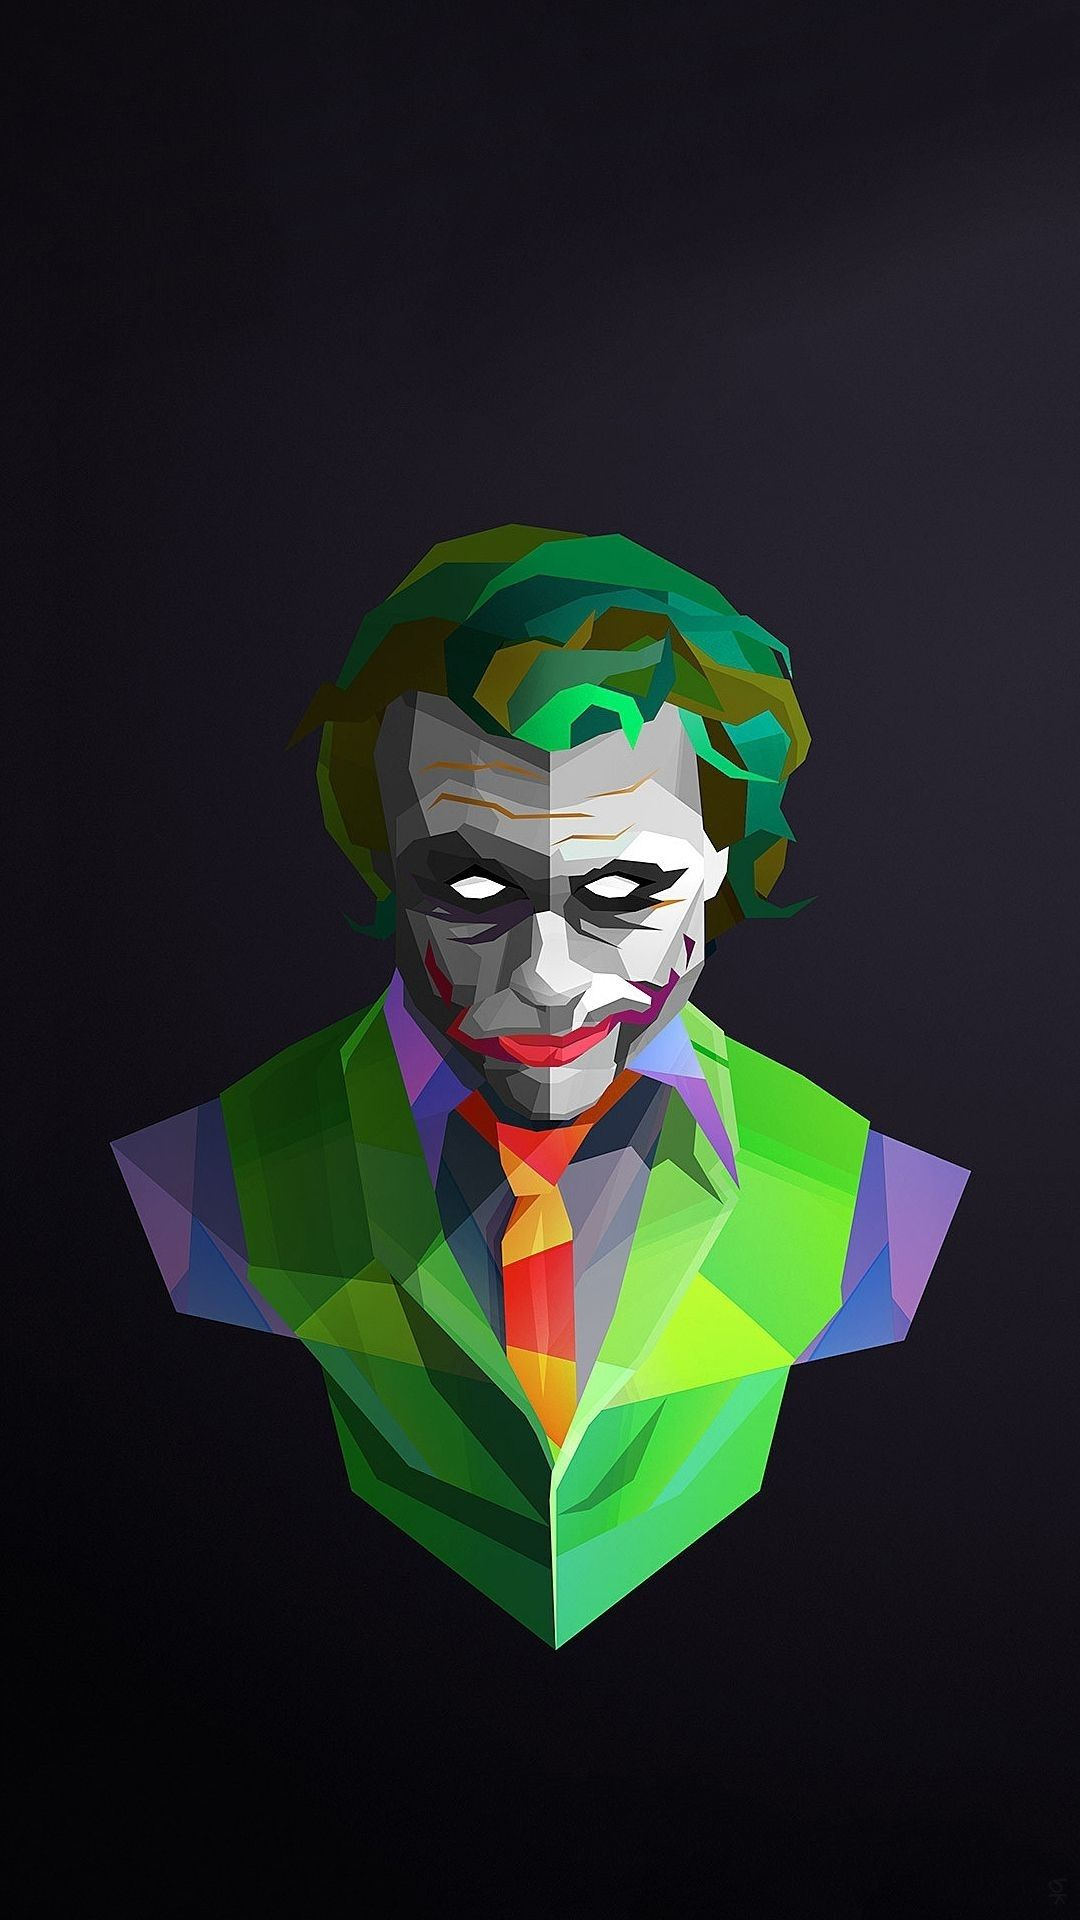 10 Top The Joker Iphone Wallpaper Full Hd 1080p For Pc Background Joker Iphone Wallpaper Joker Wallpapers Joker Hd Wallpaper